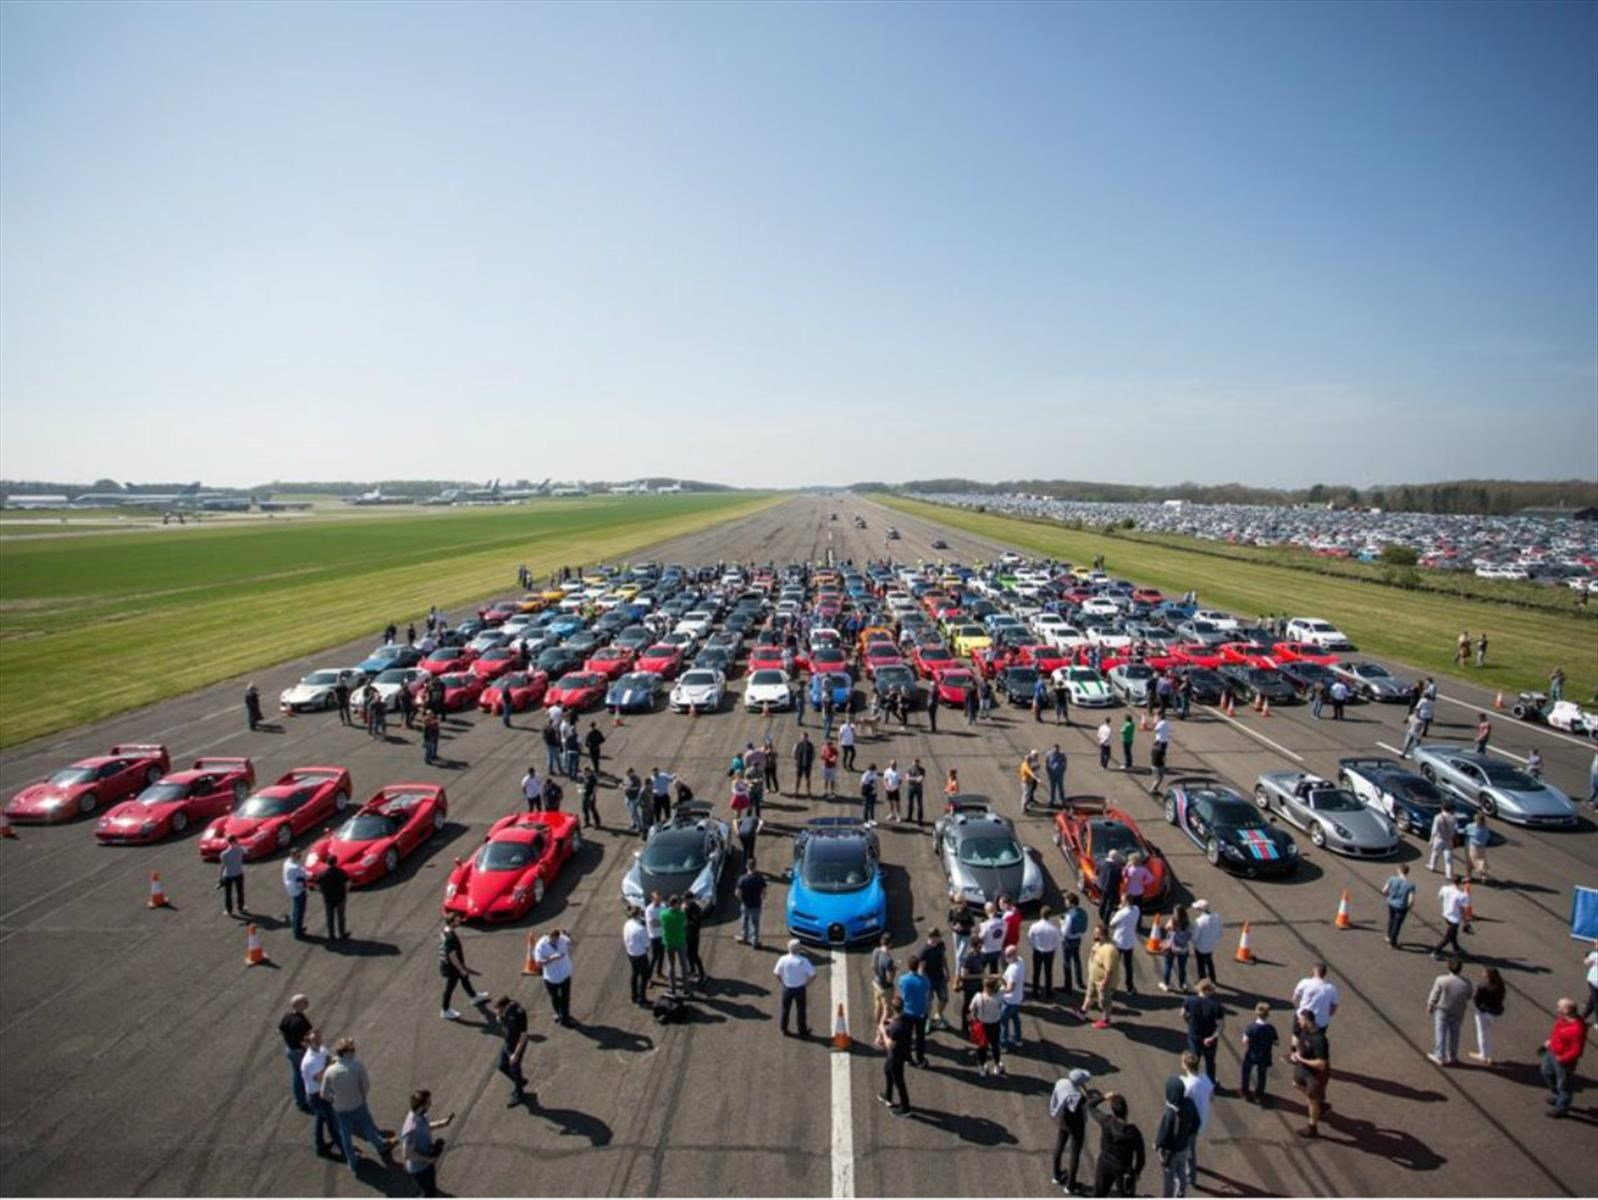 Reunión secreta de 200 super autos por una noble causa